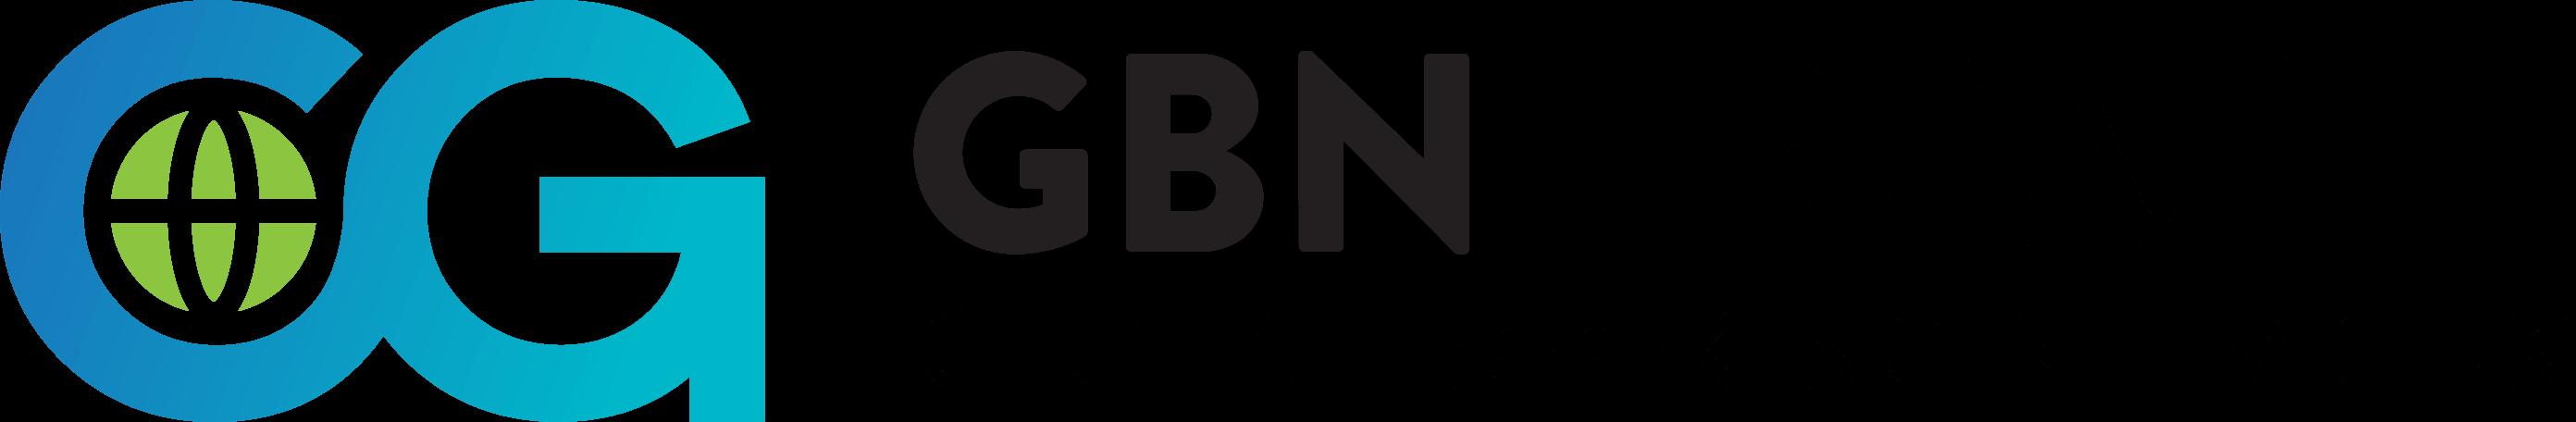 GBNTravel